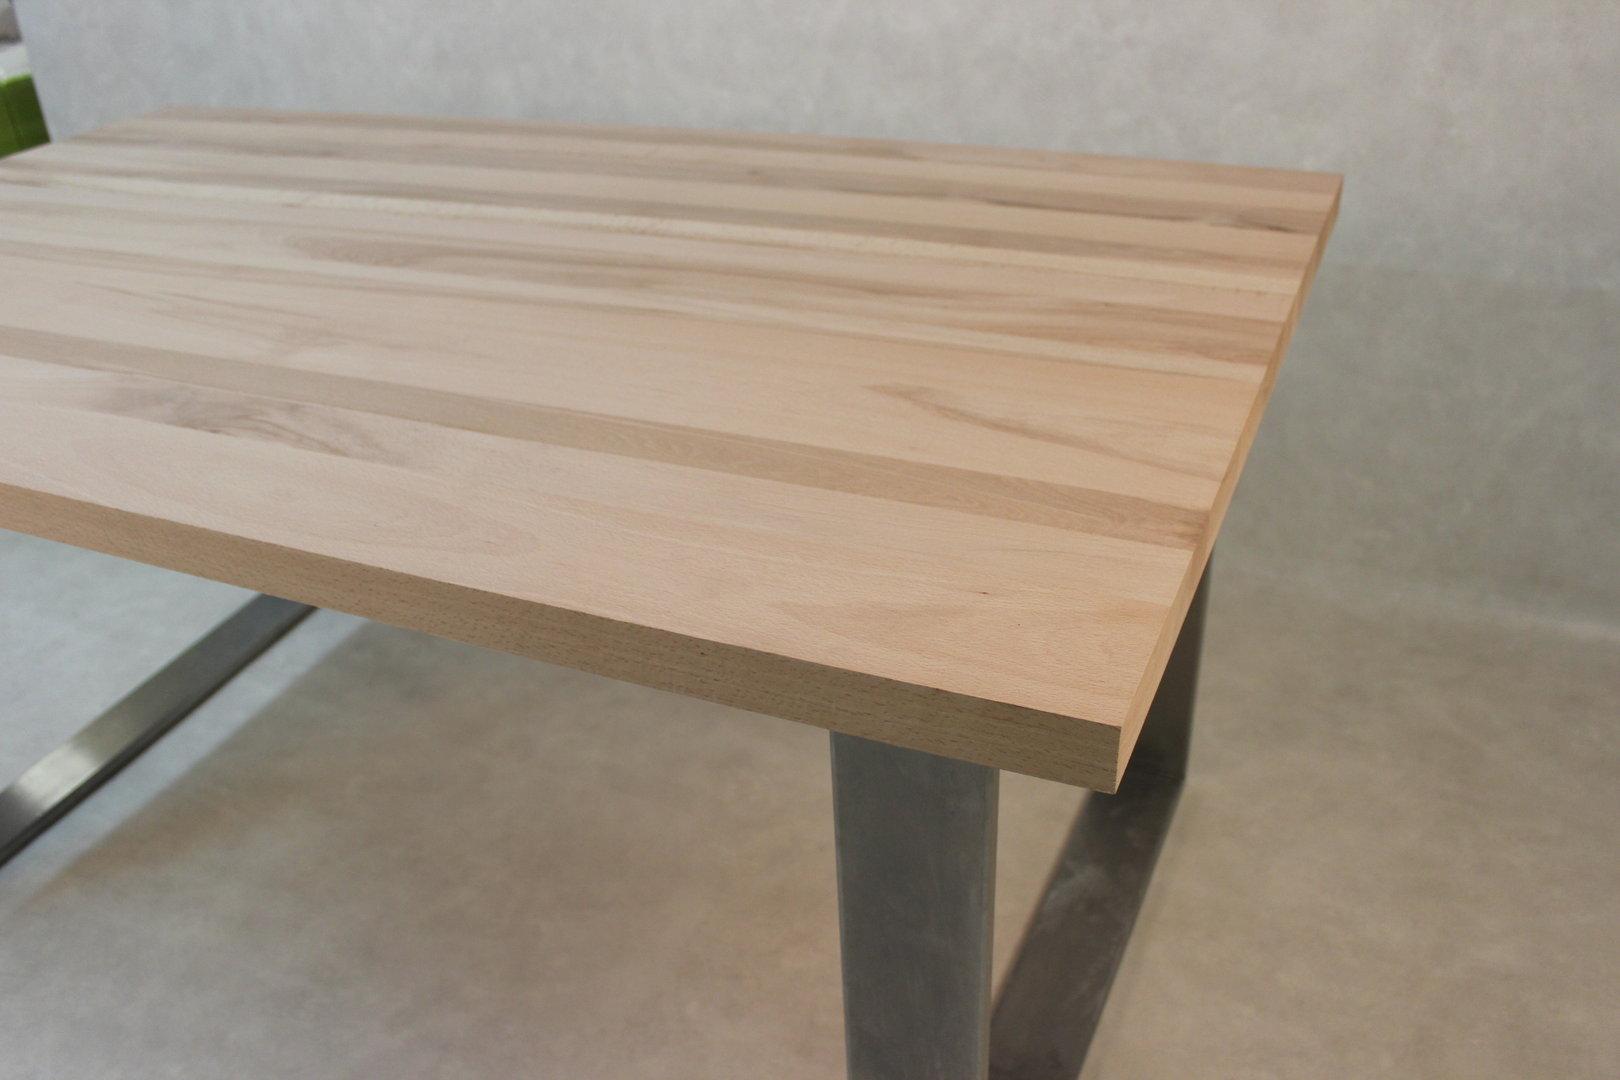 Tischplatte massivholz kernbuche dl fsc 40 x diverse for Tischplatte massivholz